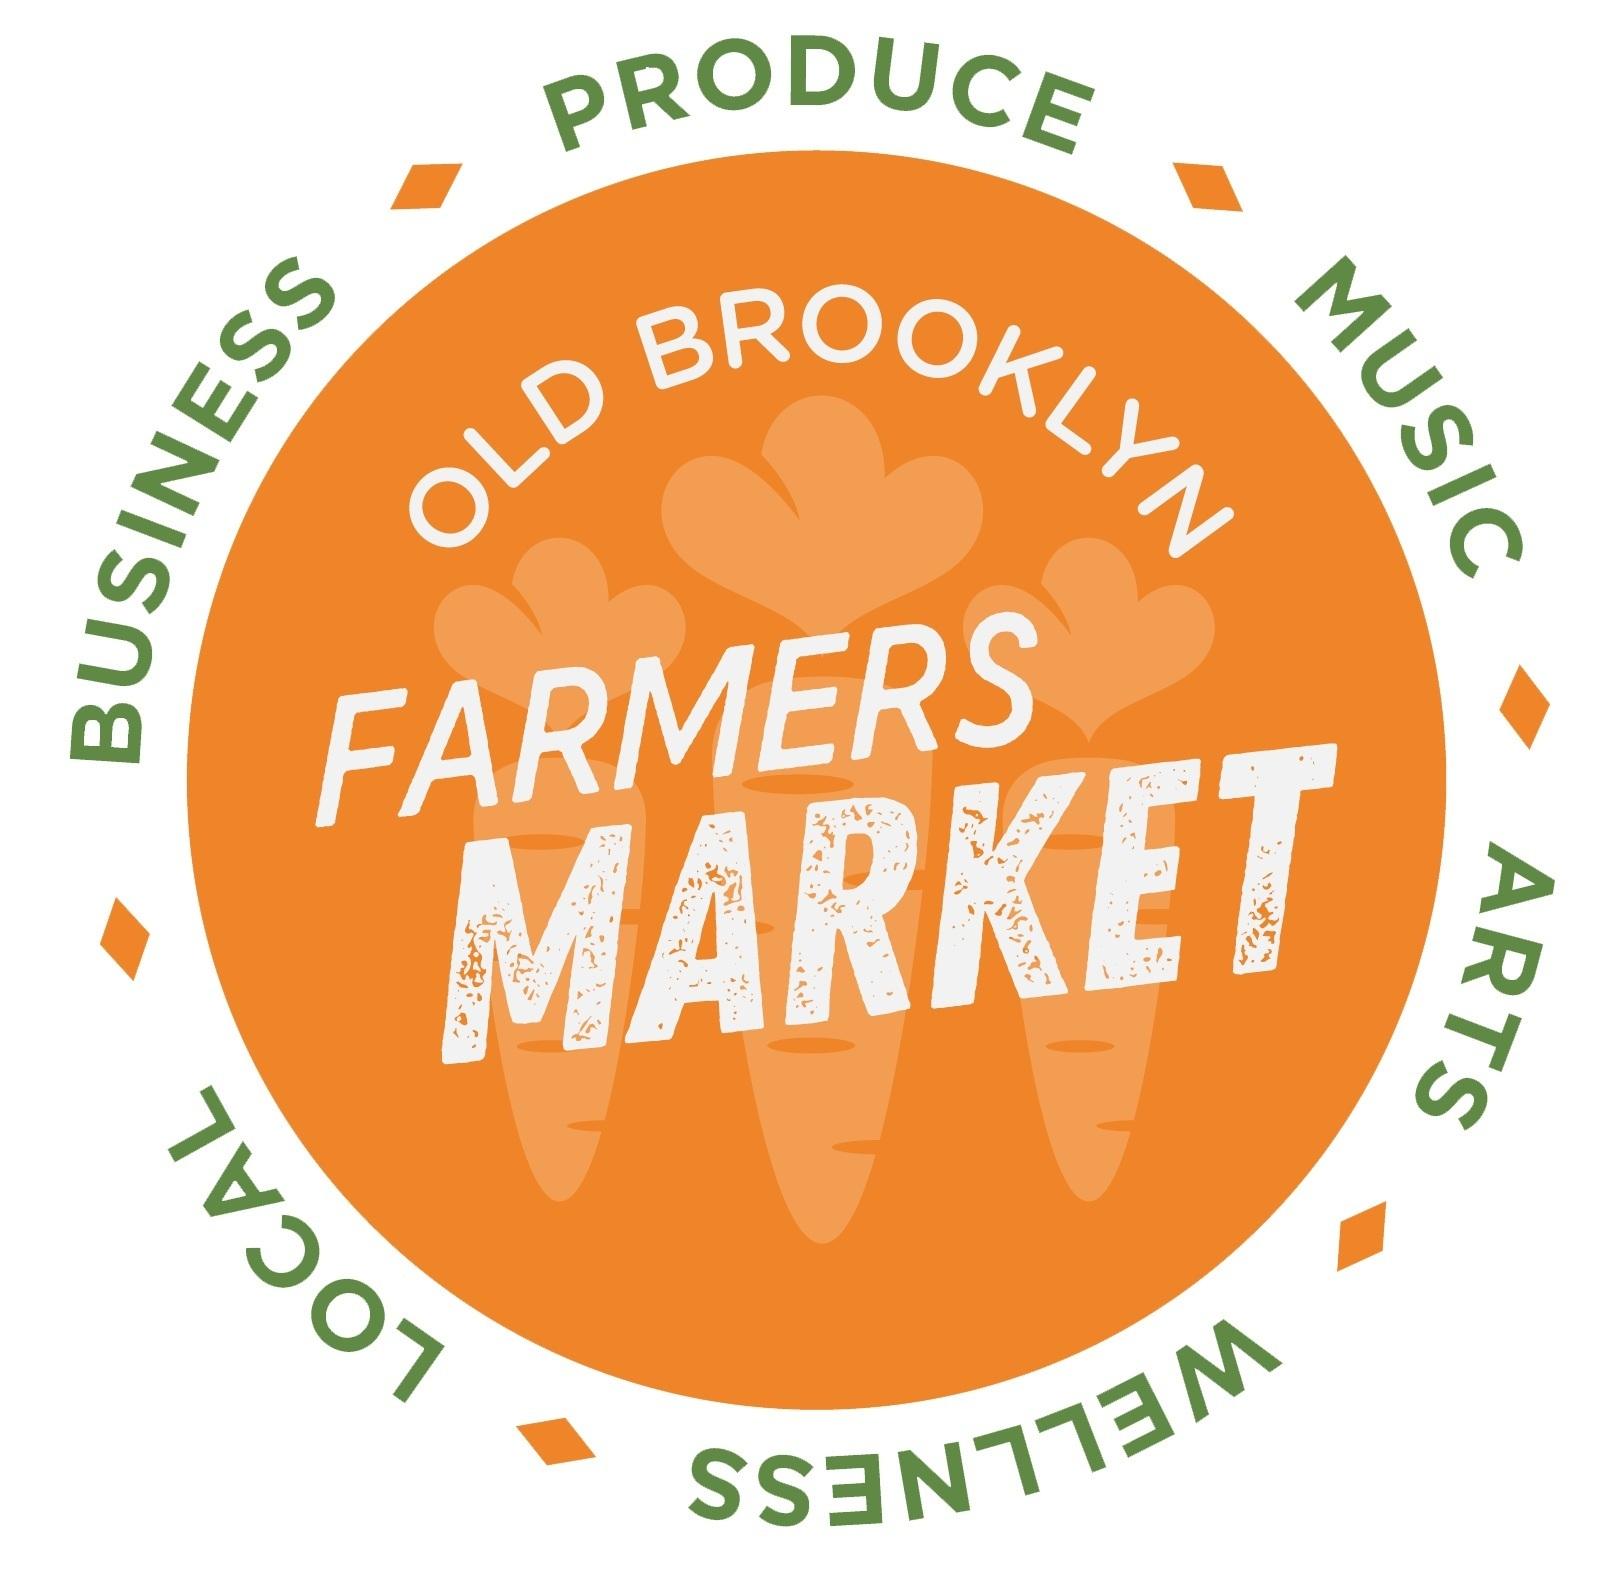 OB_FarmersMarket_Transp.jpg